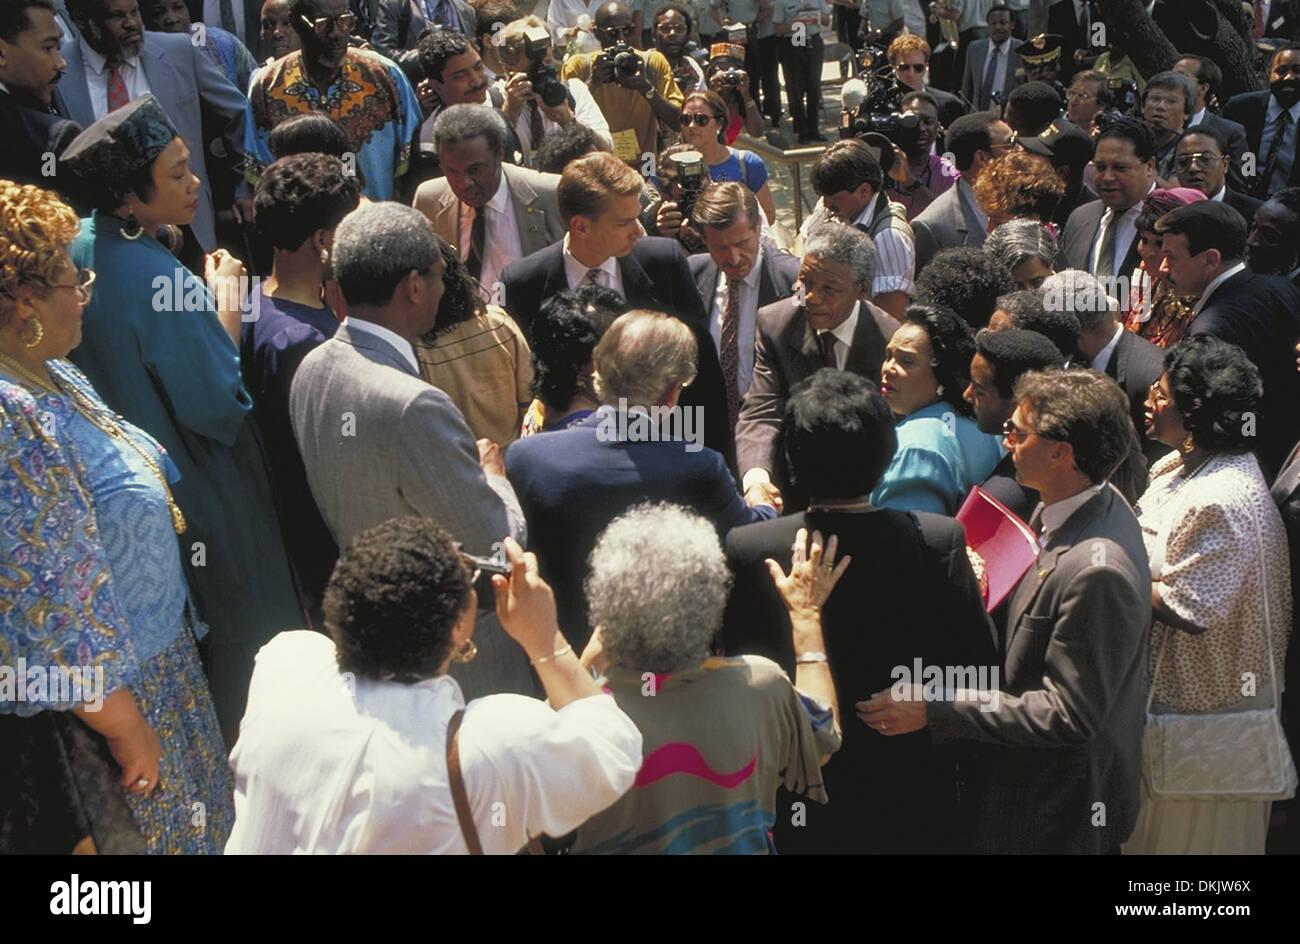 Nelson Mandela arrives at the Martin Luther King Jr. Center in Atlanta Georgia - Stock Image